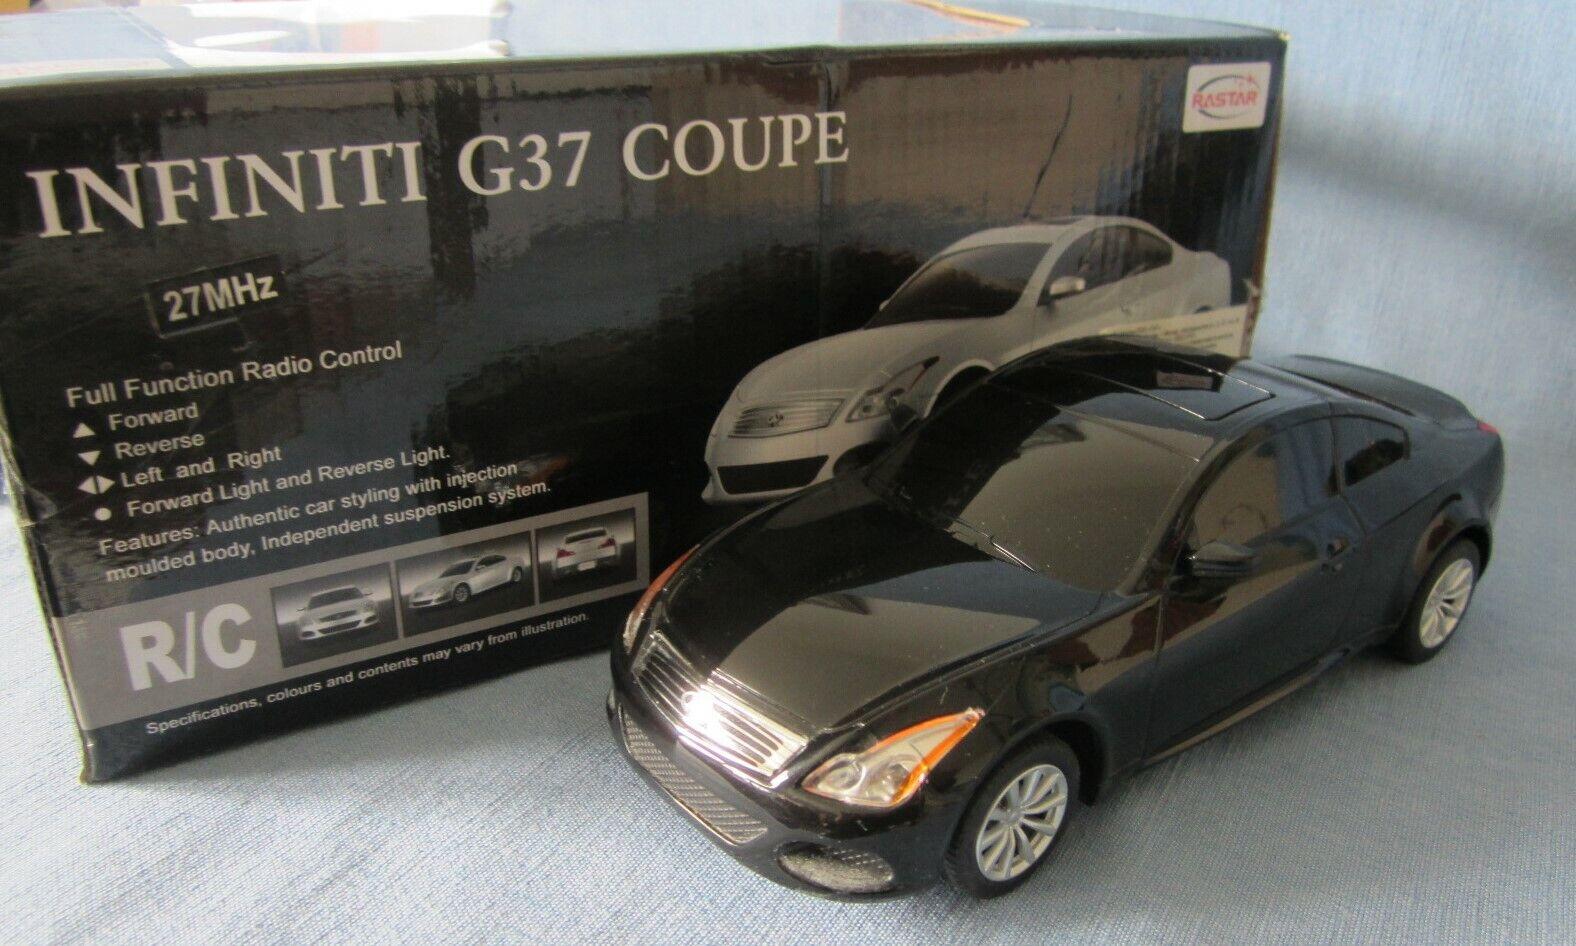 Infiniti g37 coupé 1 24 RC de 2011 radio controlled Nissan Skyline maqueta de coche